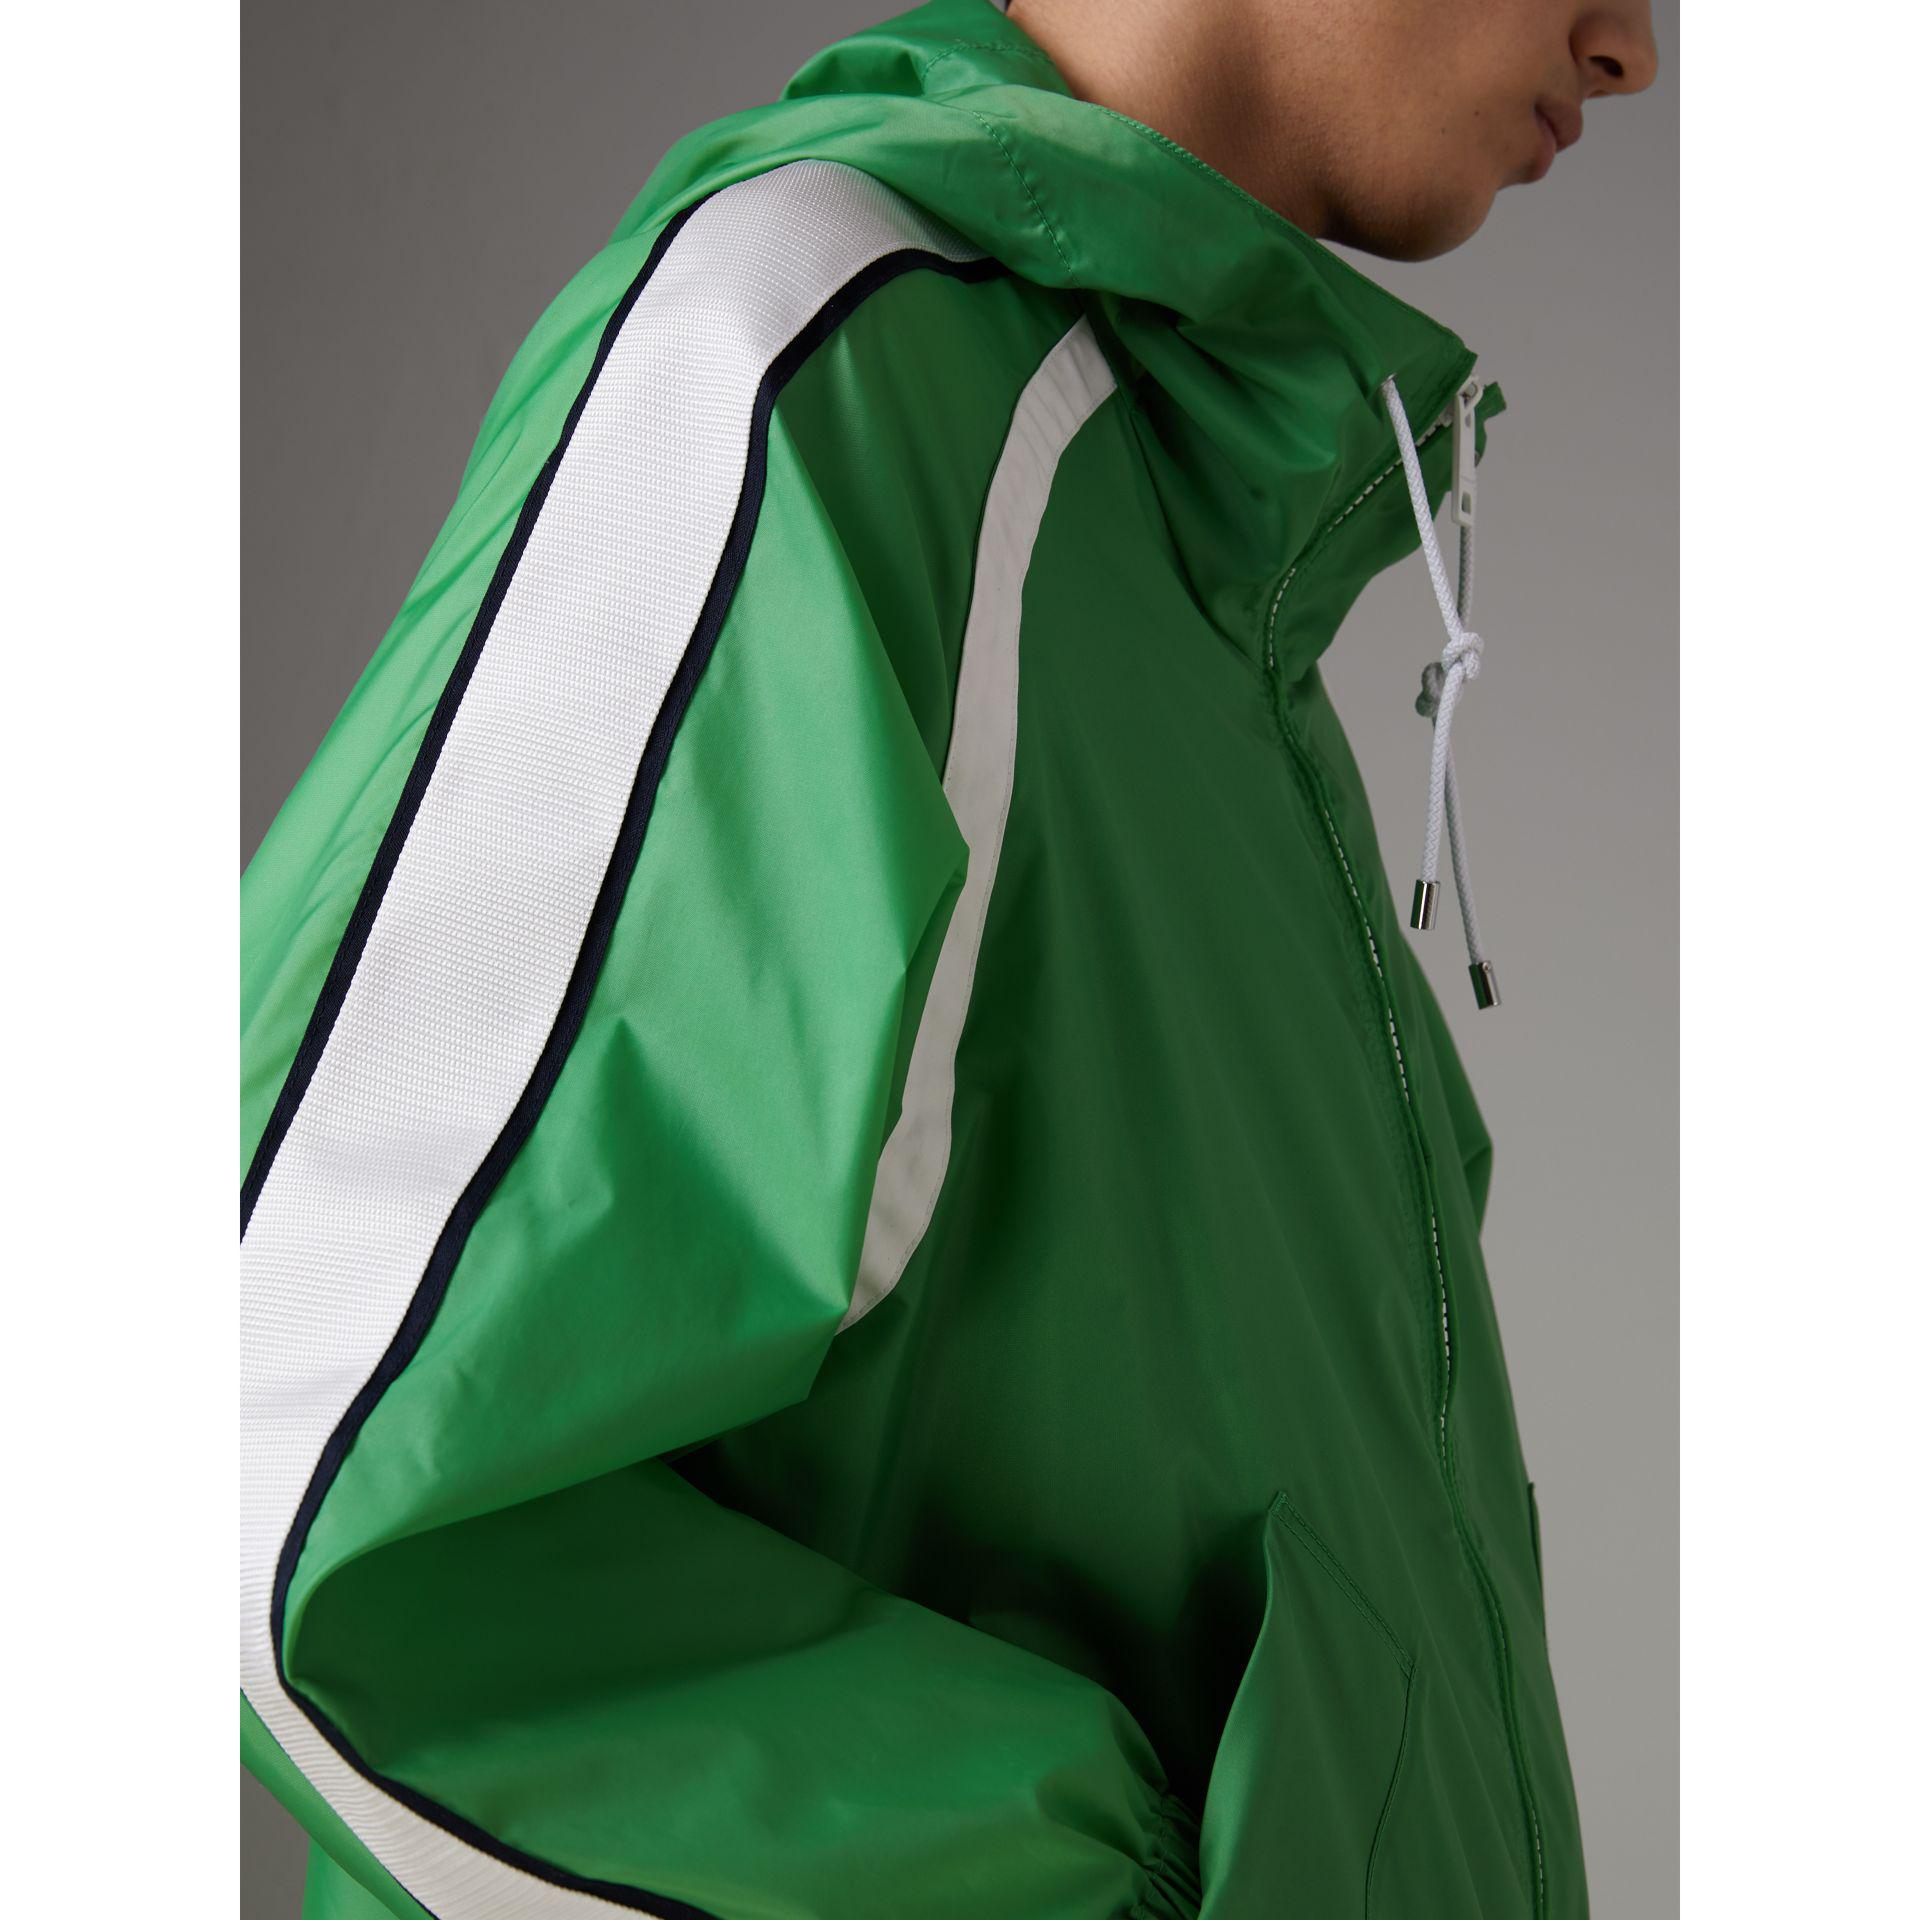 8bac620979c8 Burberry Stripe Detail Showerproof Hooded Jacket in Green for Men ...